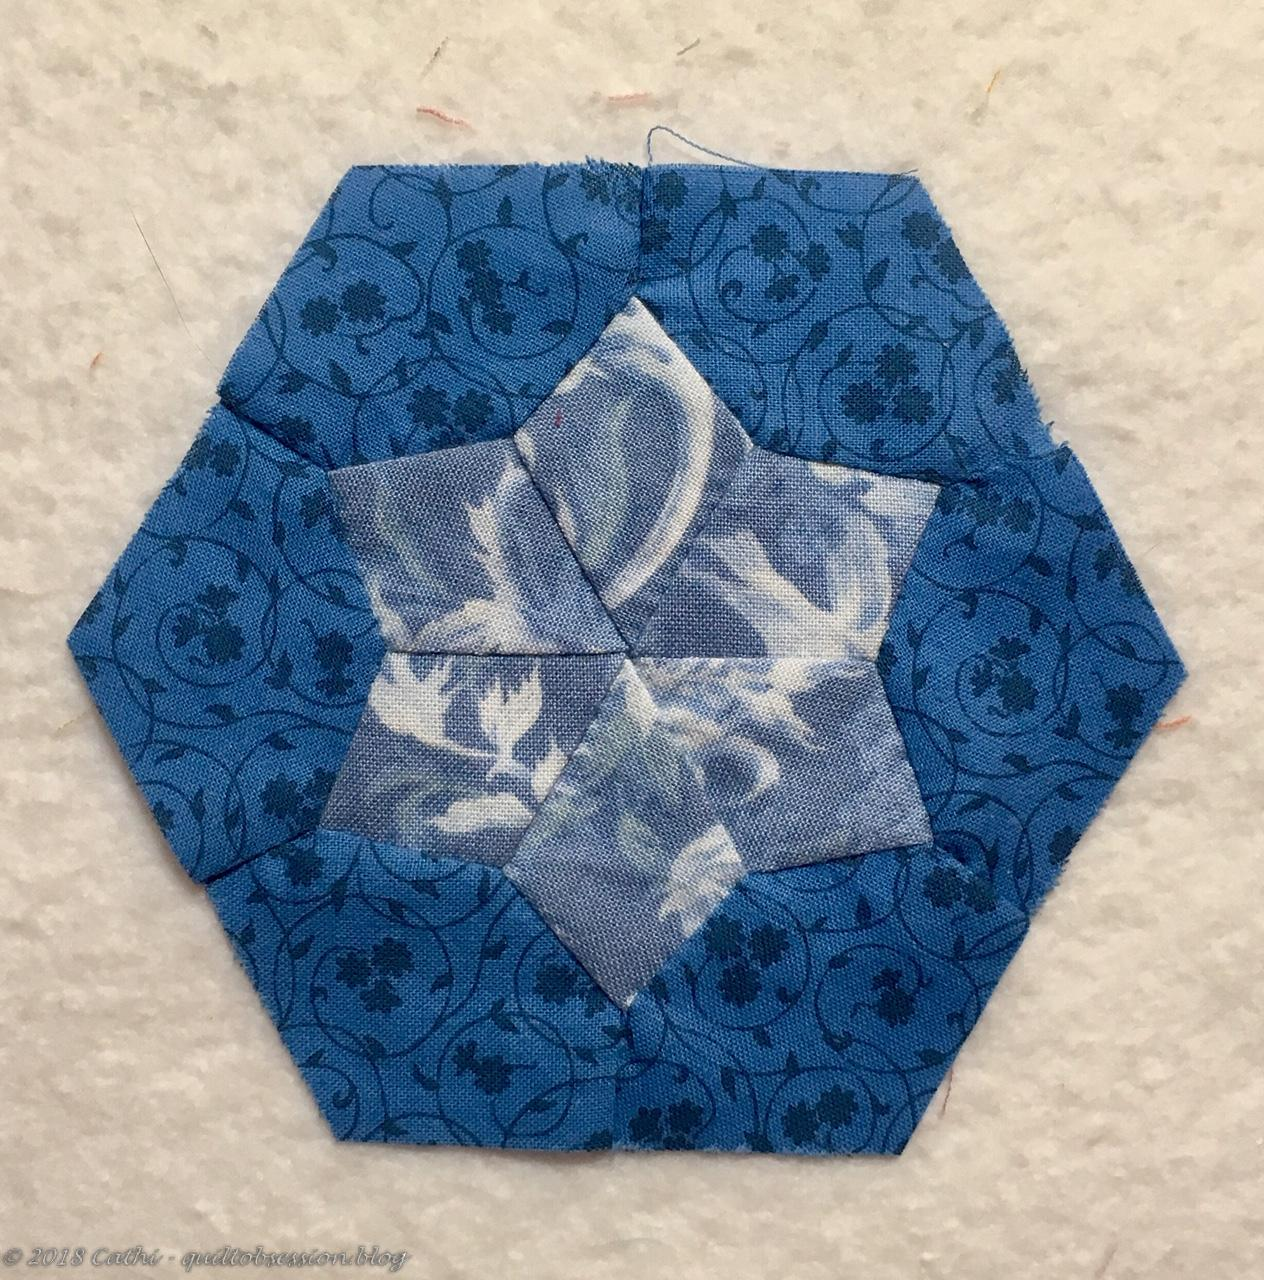 Blue Pieced Hexagon Block IMG_2578wtmk